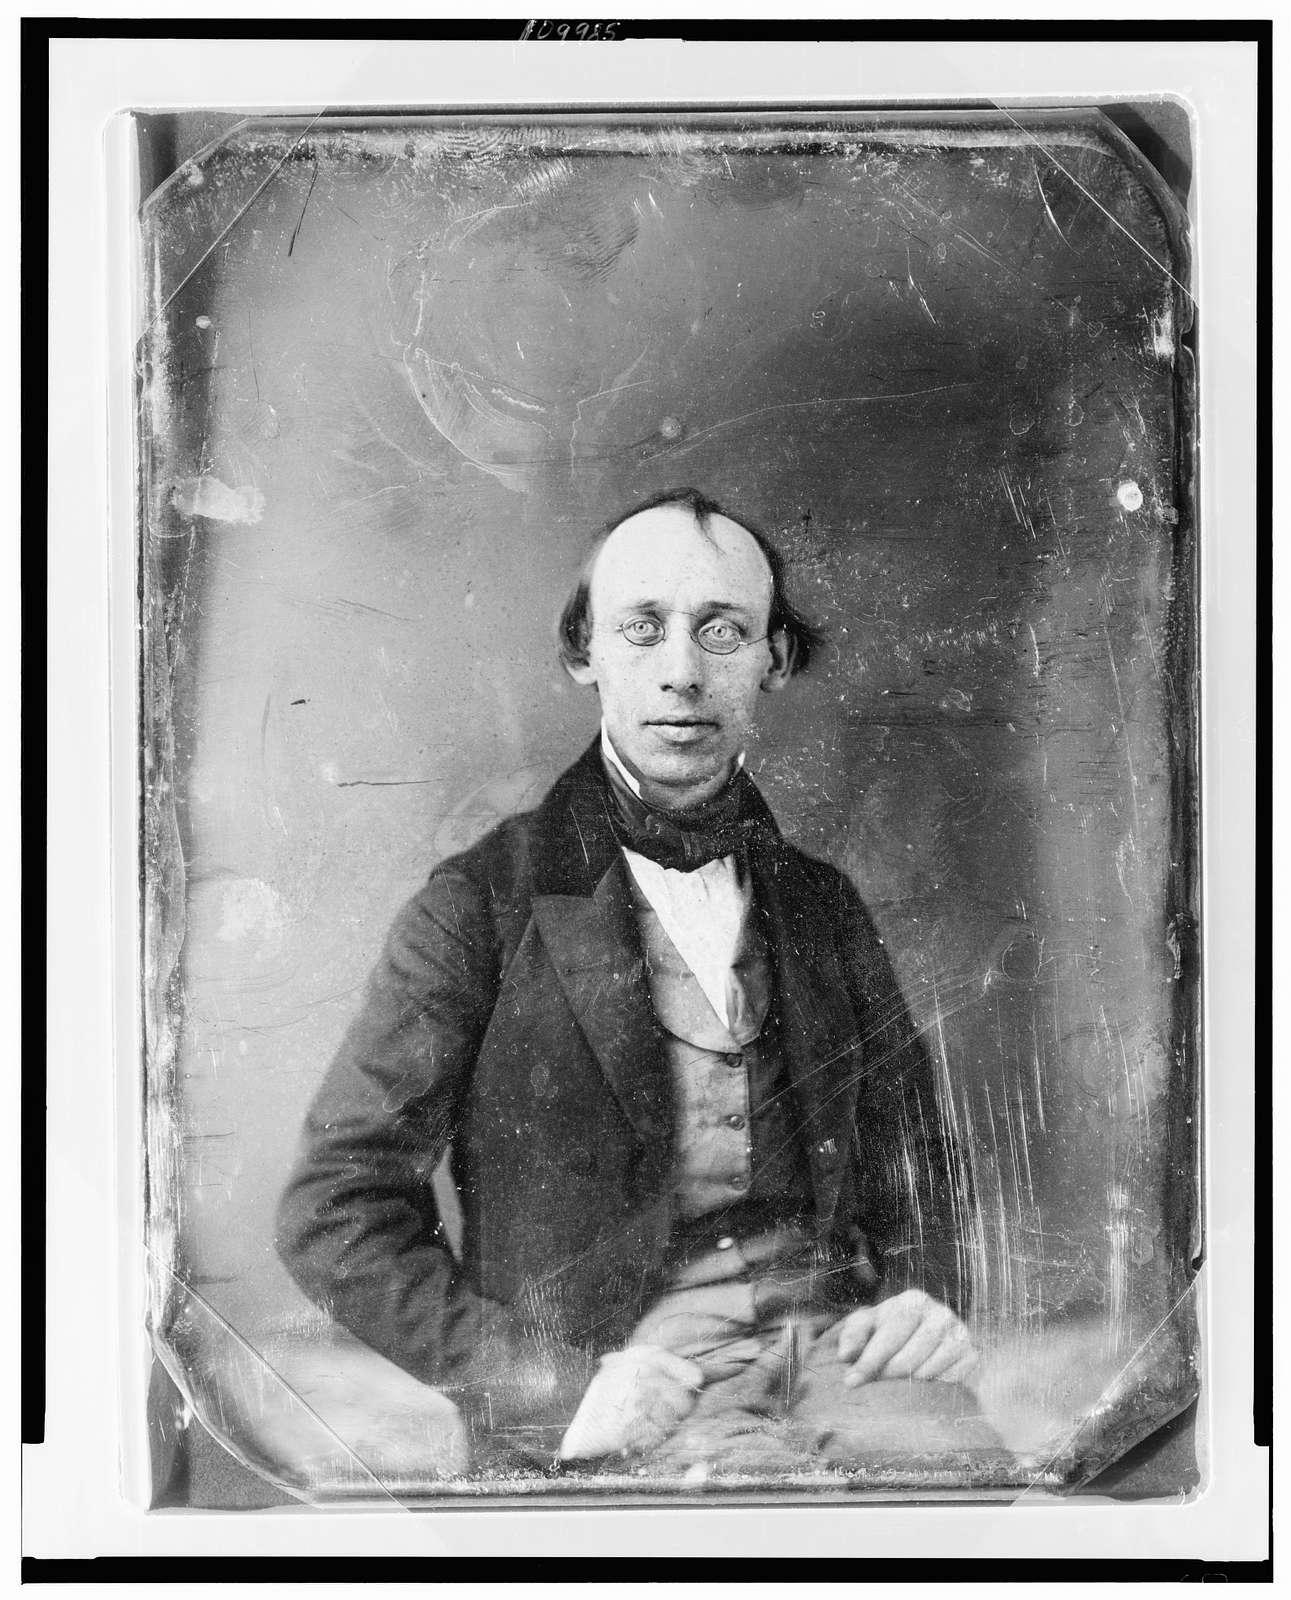 [Cornelius Mathews, half-length portrait, facing front, wearing spectacles]